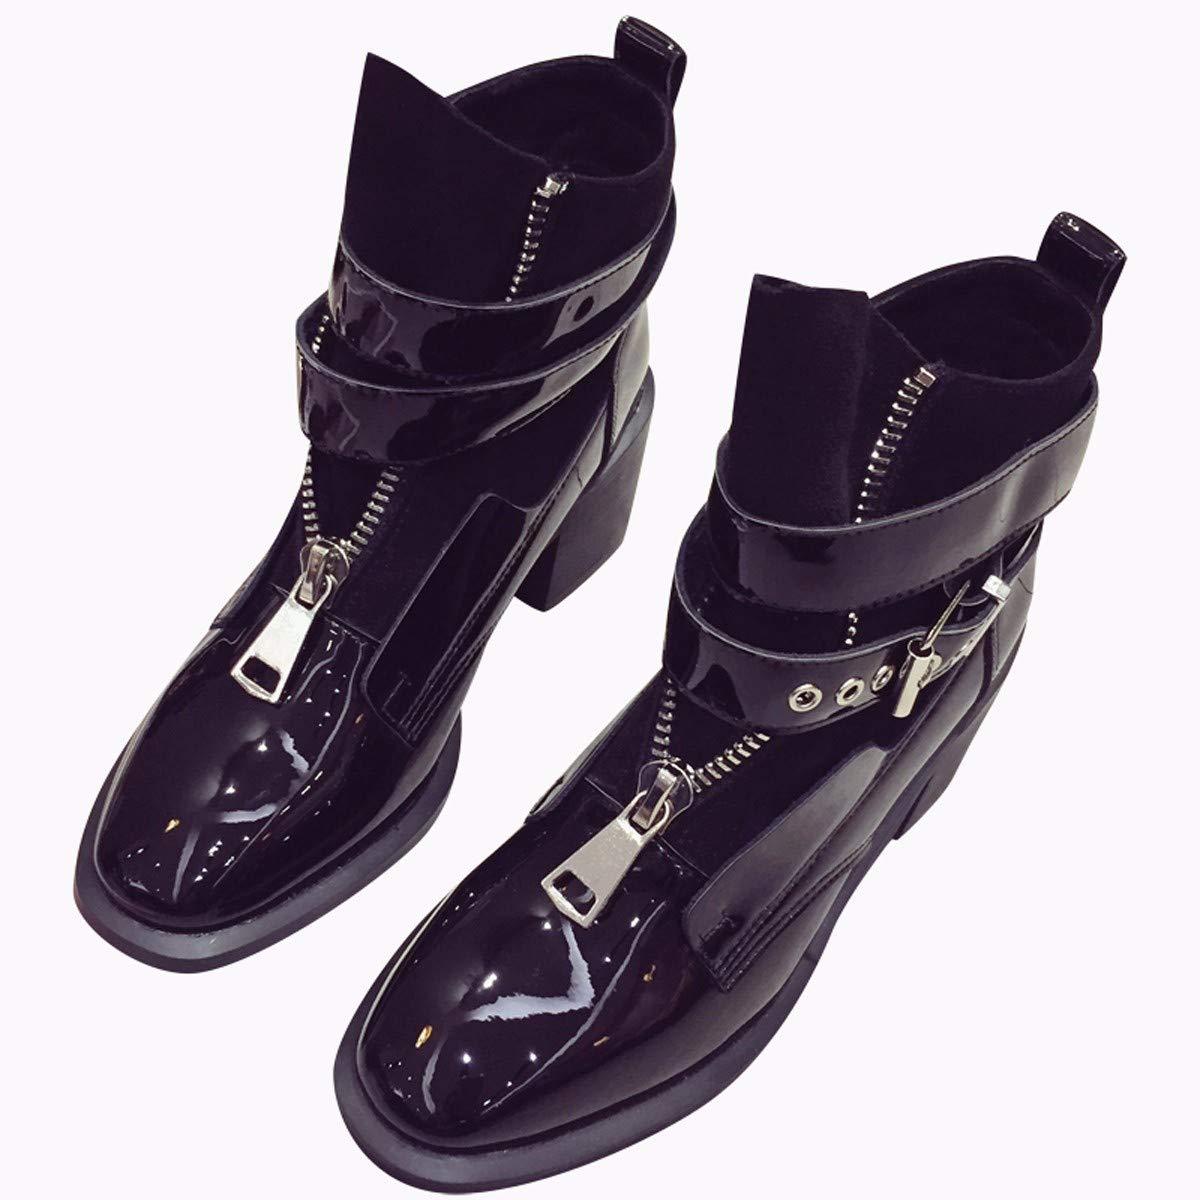 AJUNR Modische Arbeit Damenschuhe Mode Kurze Stiefel mit hohen 6 cm wild Lack scharfe Spitze reißverschluss gürtel ma dingxue